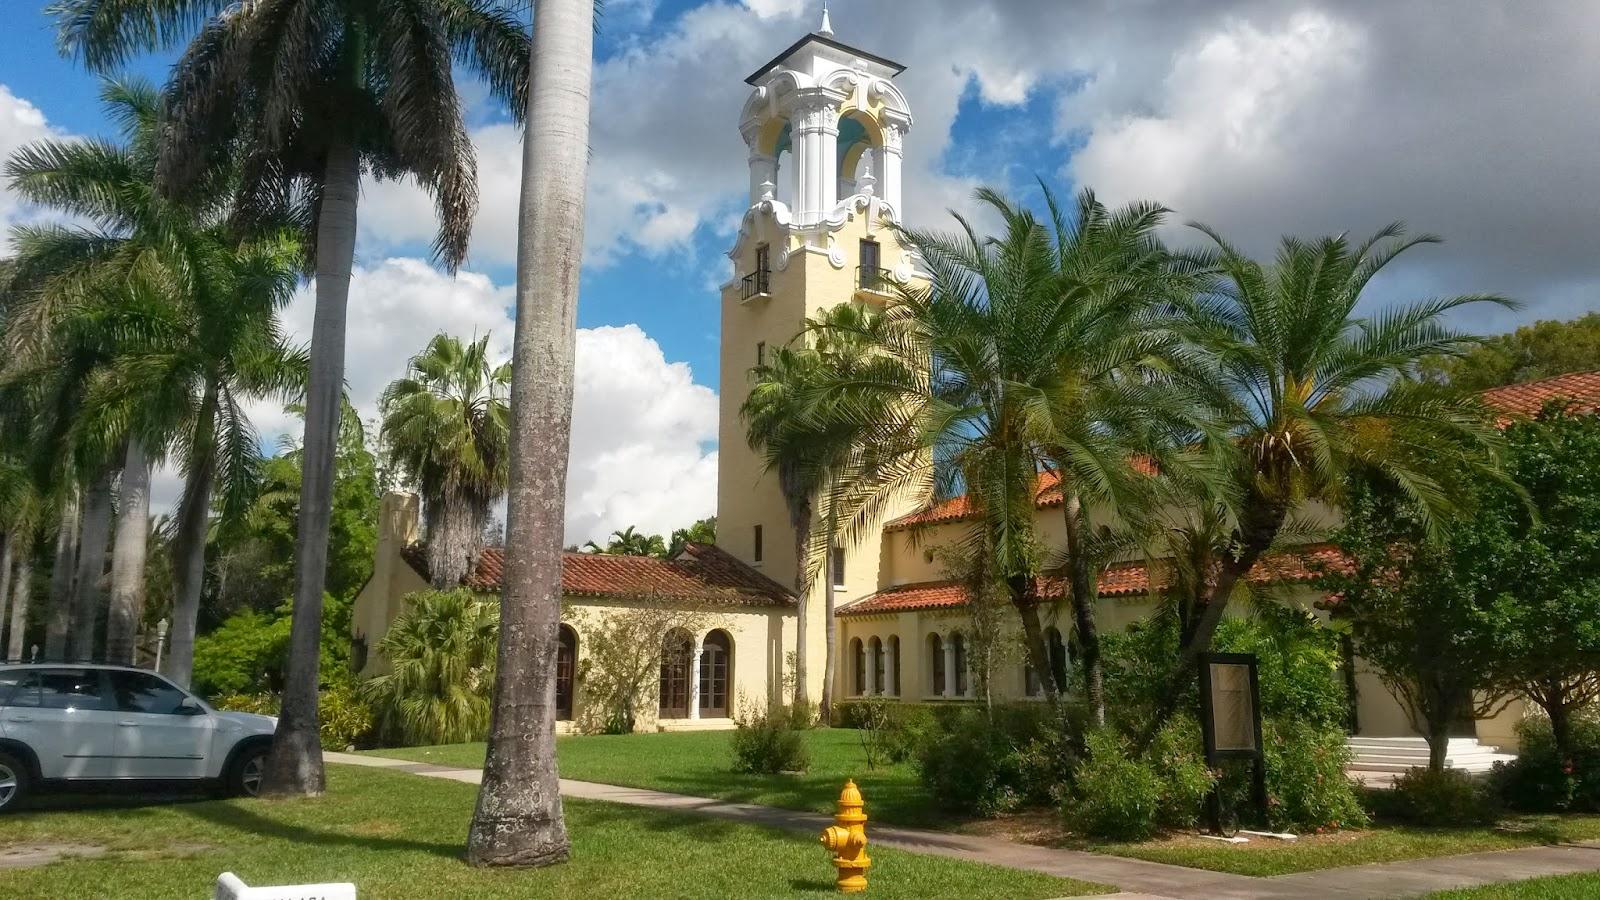 Congregational Church, Coral Gables, Miami, Florida, Elisa N, Blog de Viajes, Lifestyle, Travel